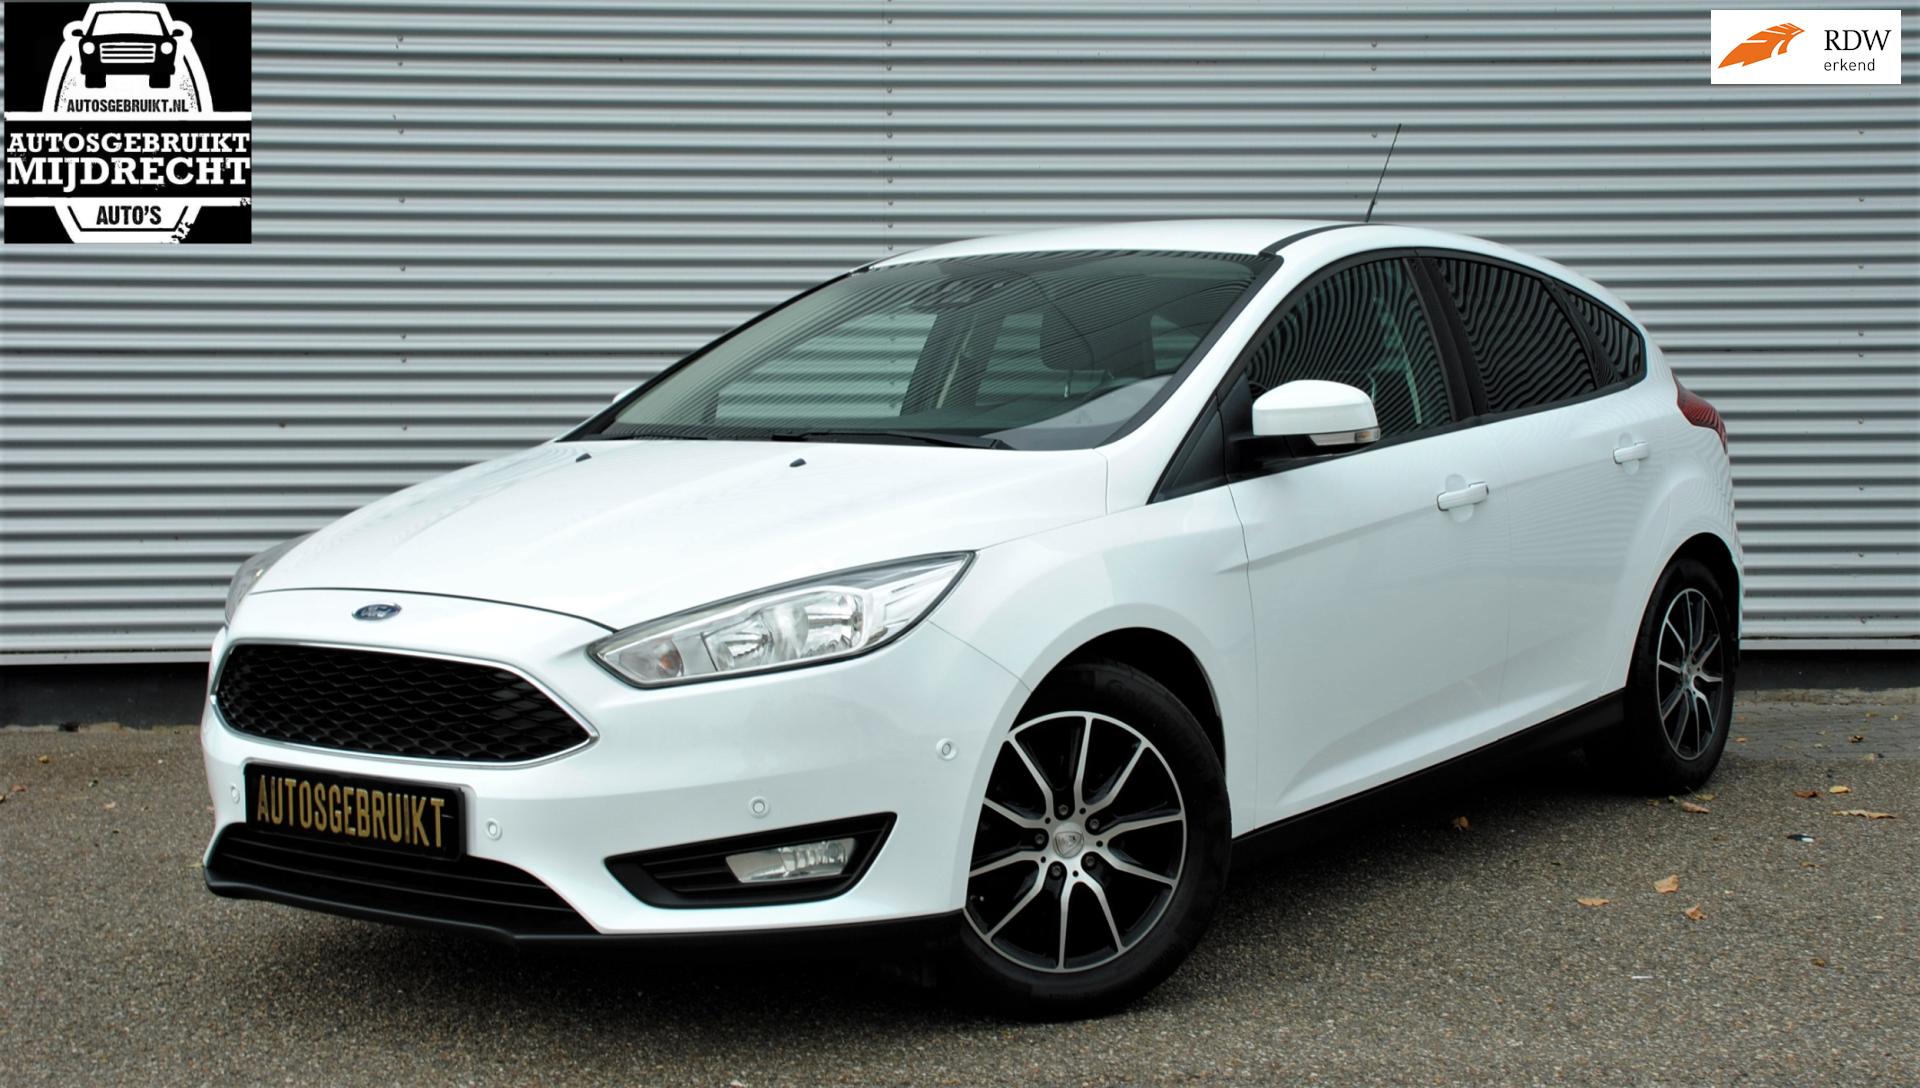 Ford Focus occasion - Autosgebruikt Mijdrecht